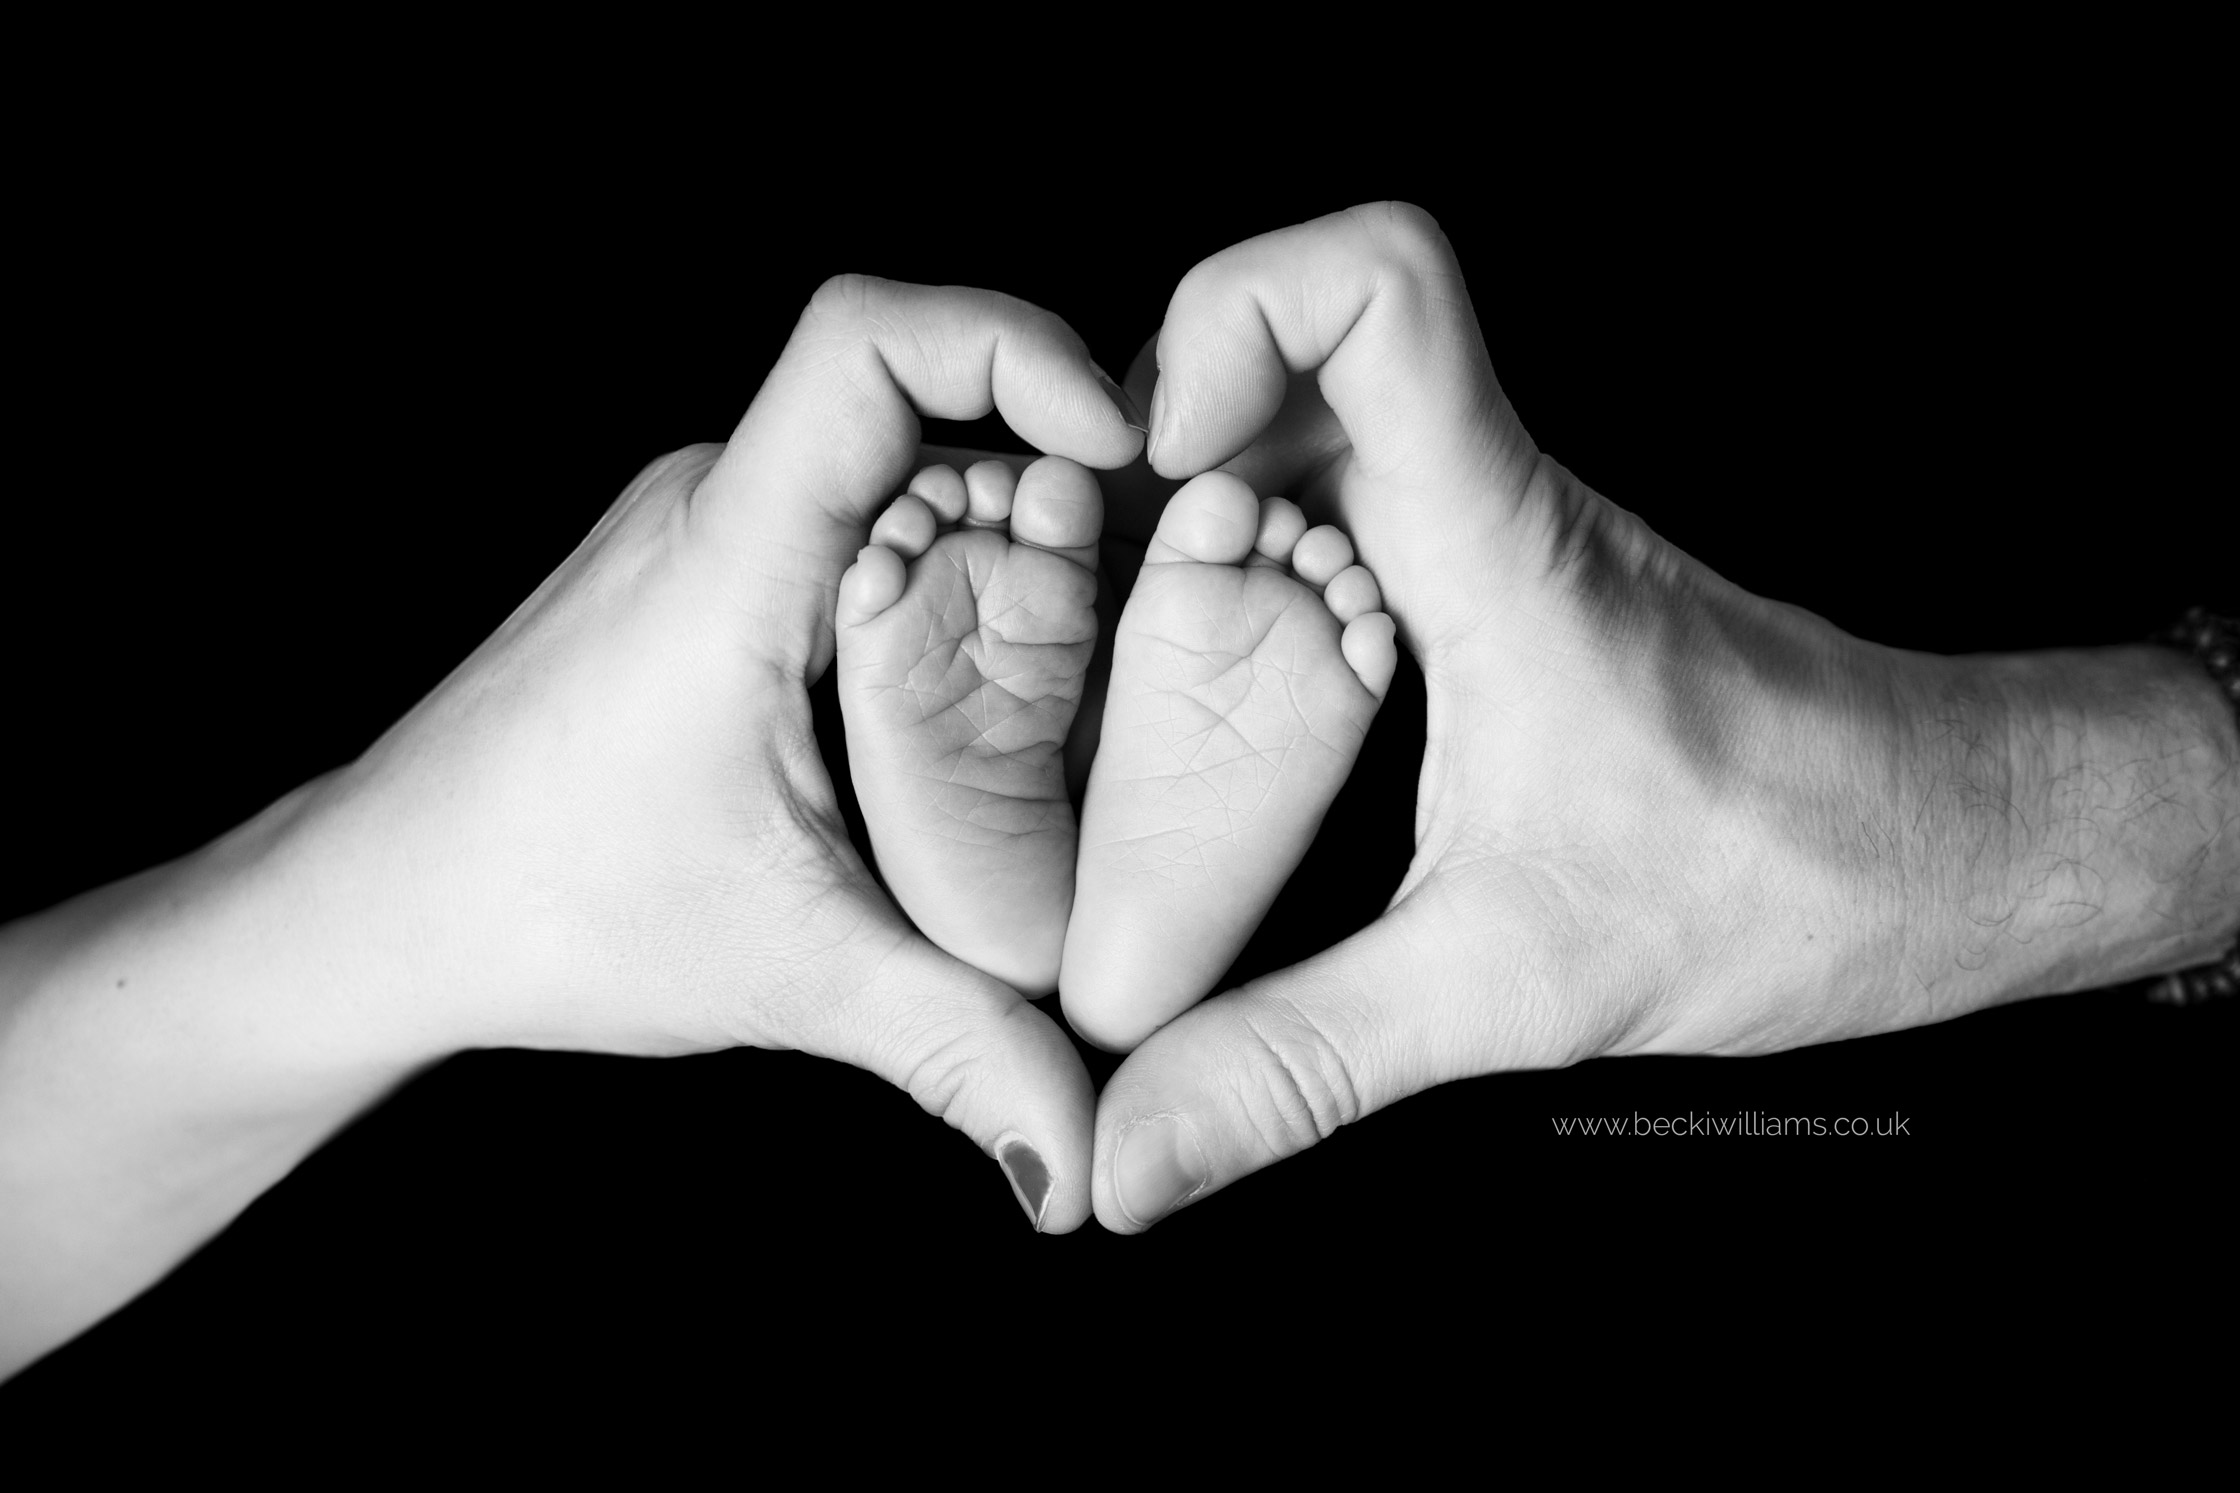 parents hands making a heart shape while holding their newborn babies feet